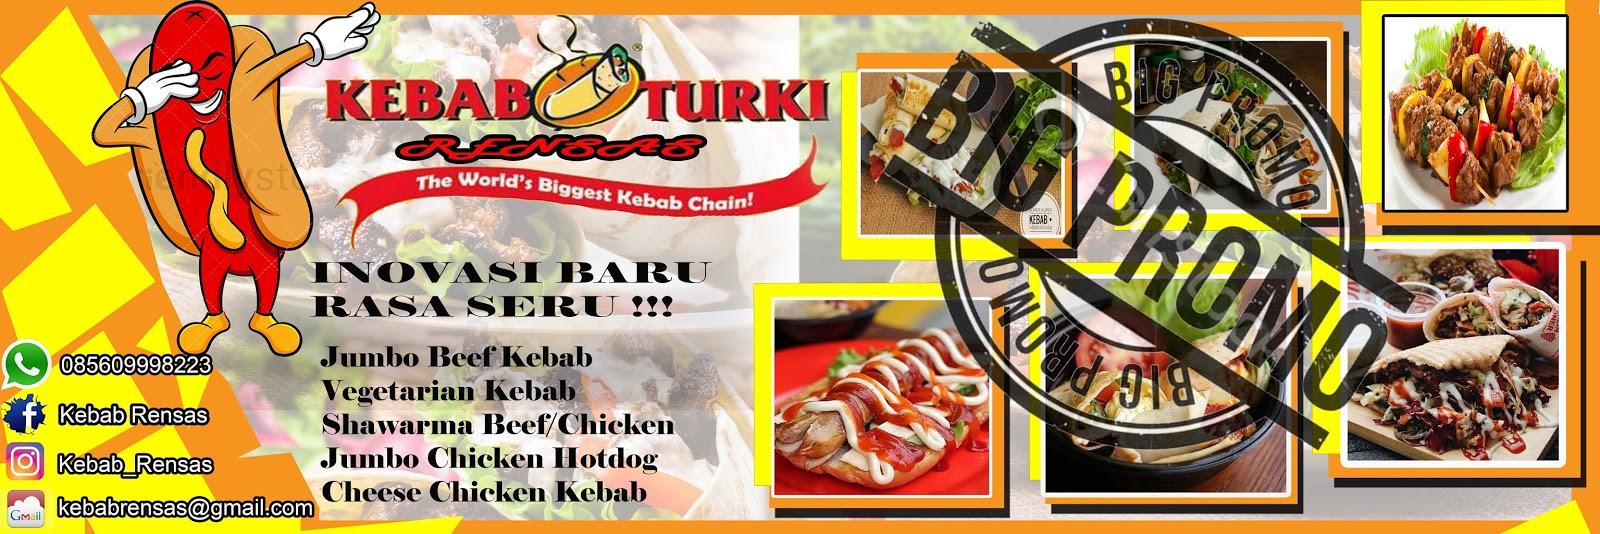 Desain Spanduk Kebab - desain spanduk keren